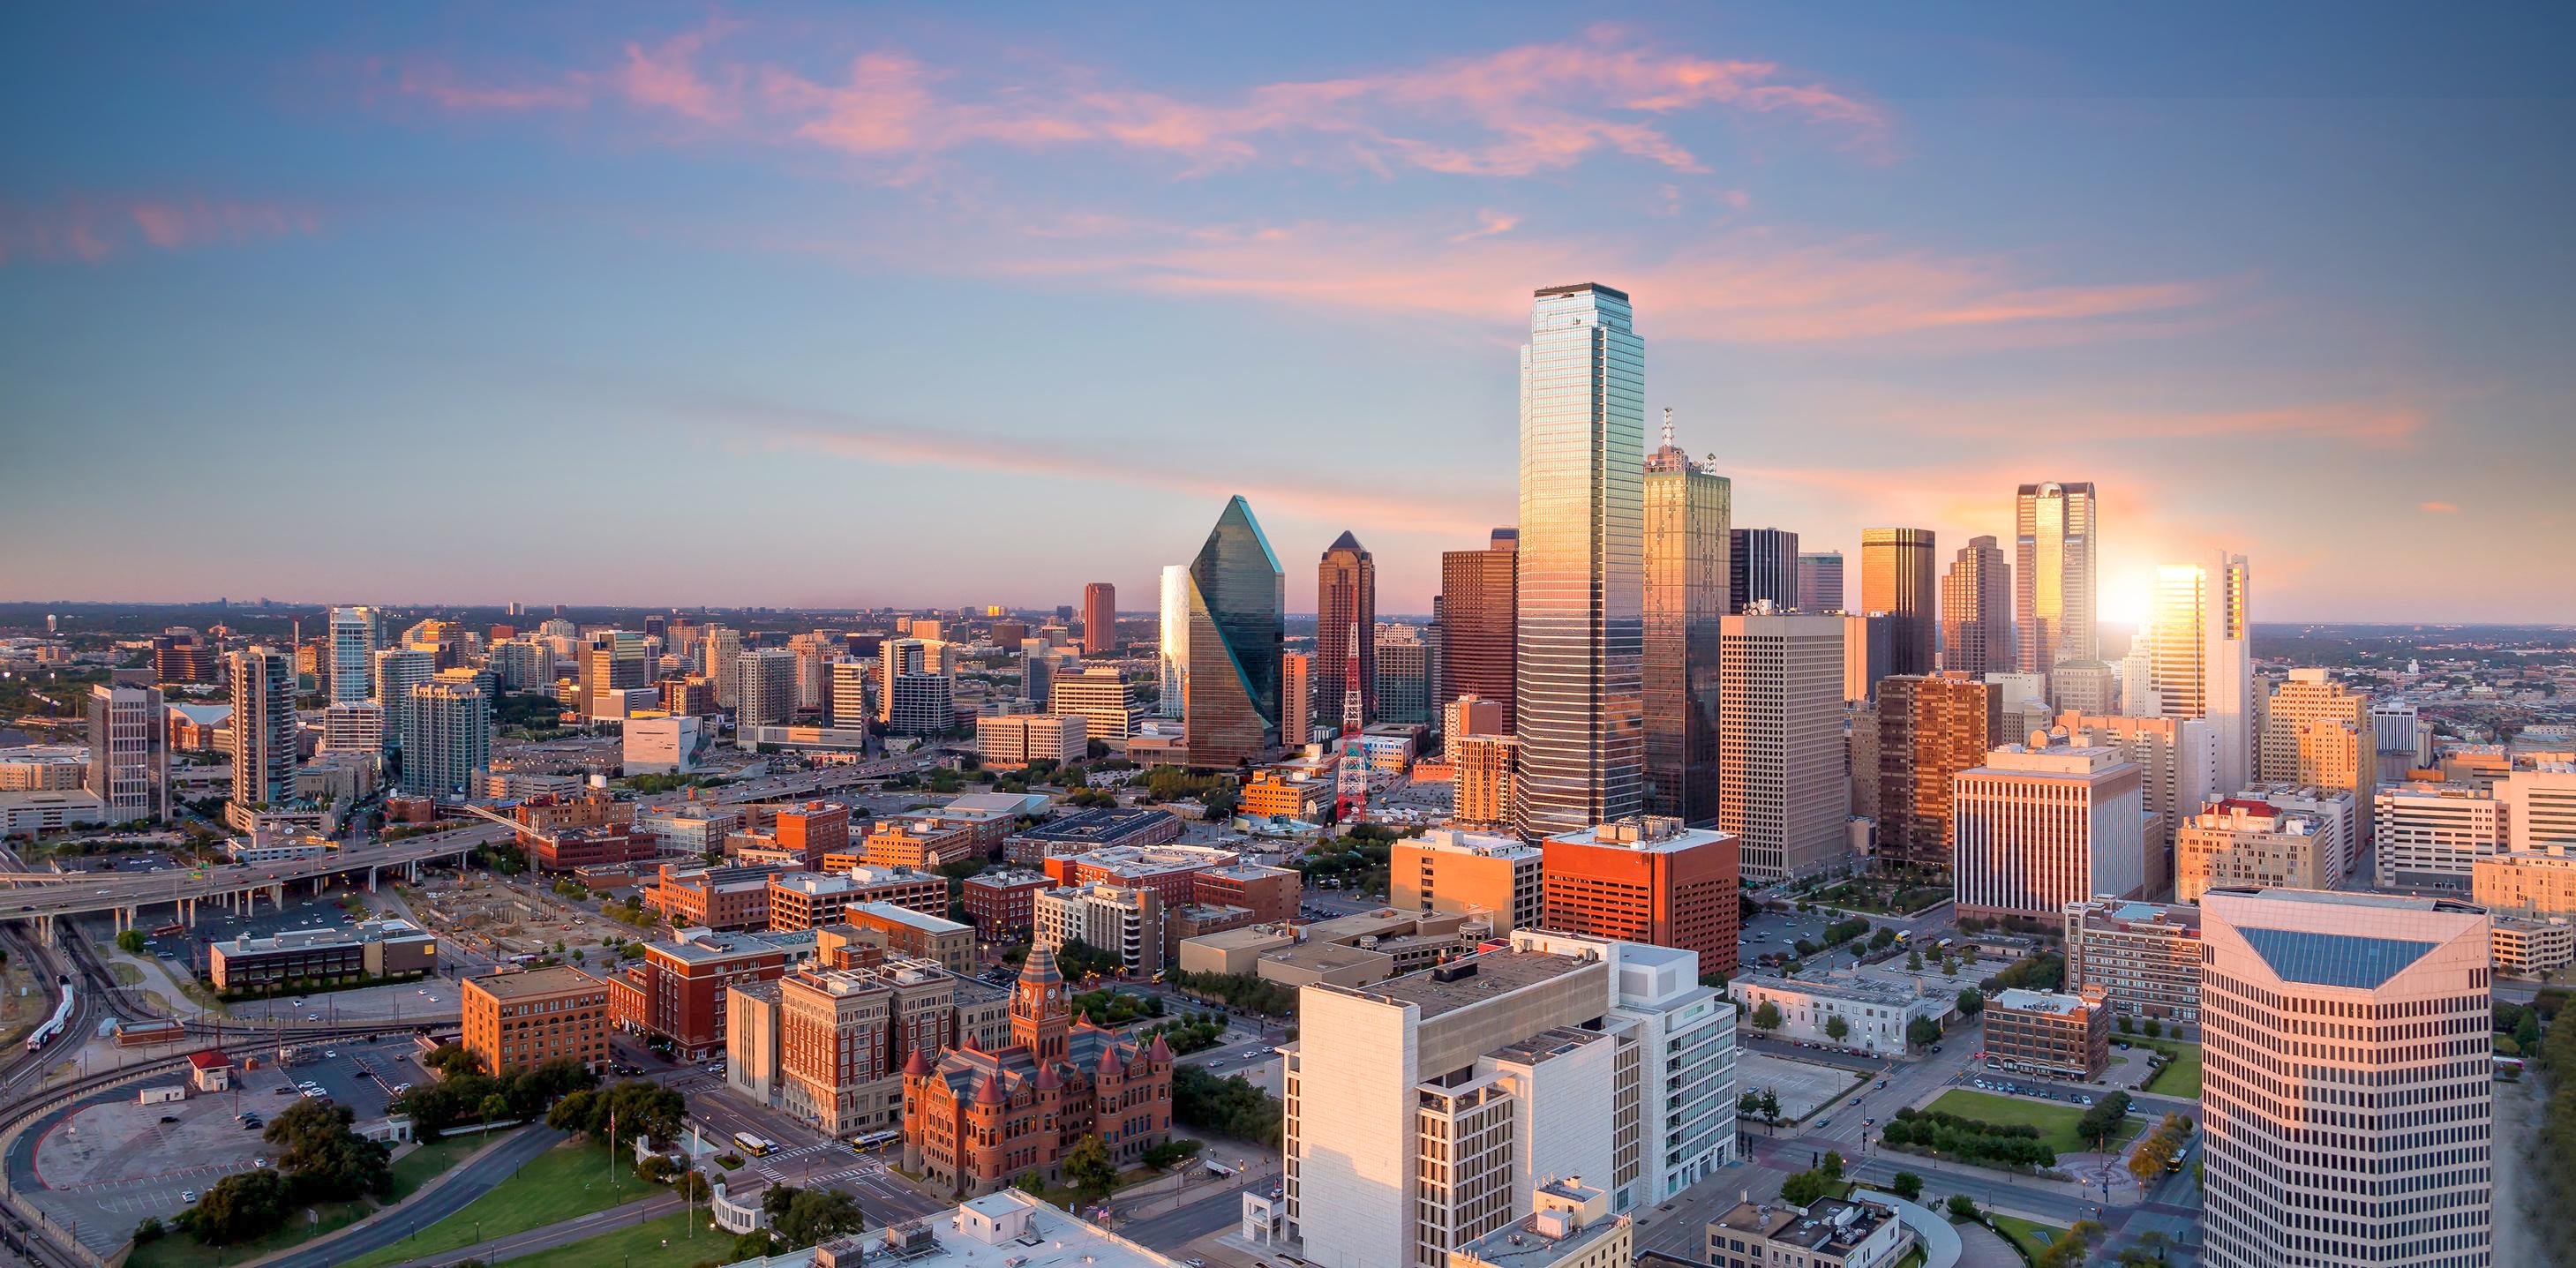 City line of dallas texas